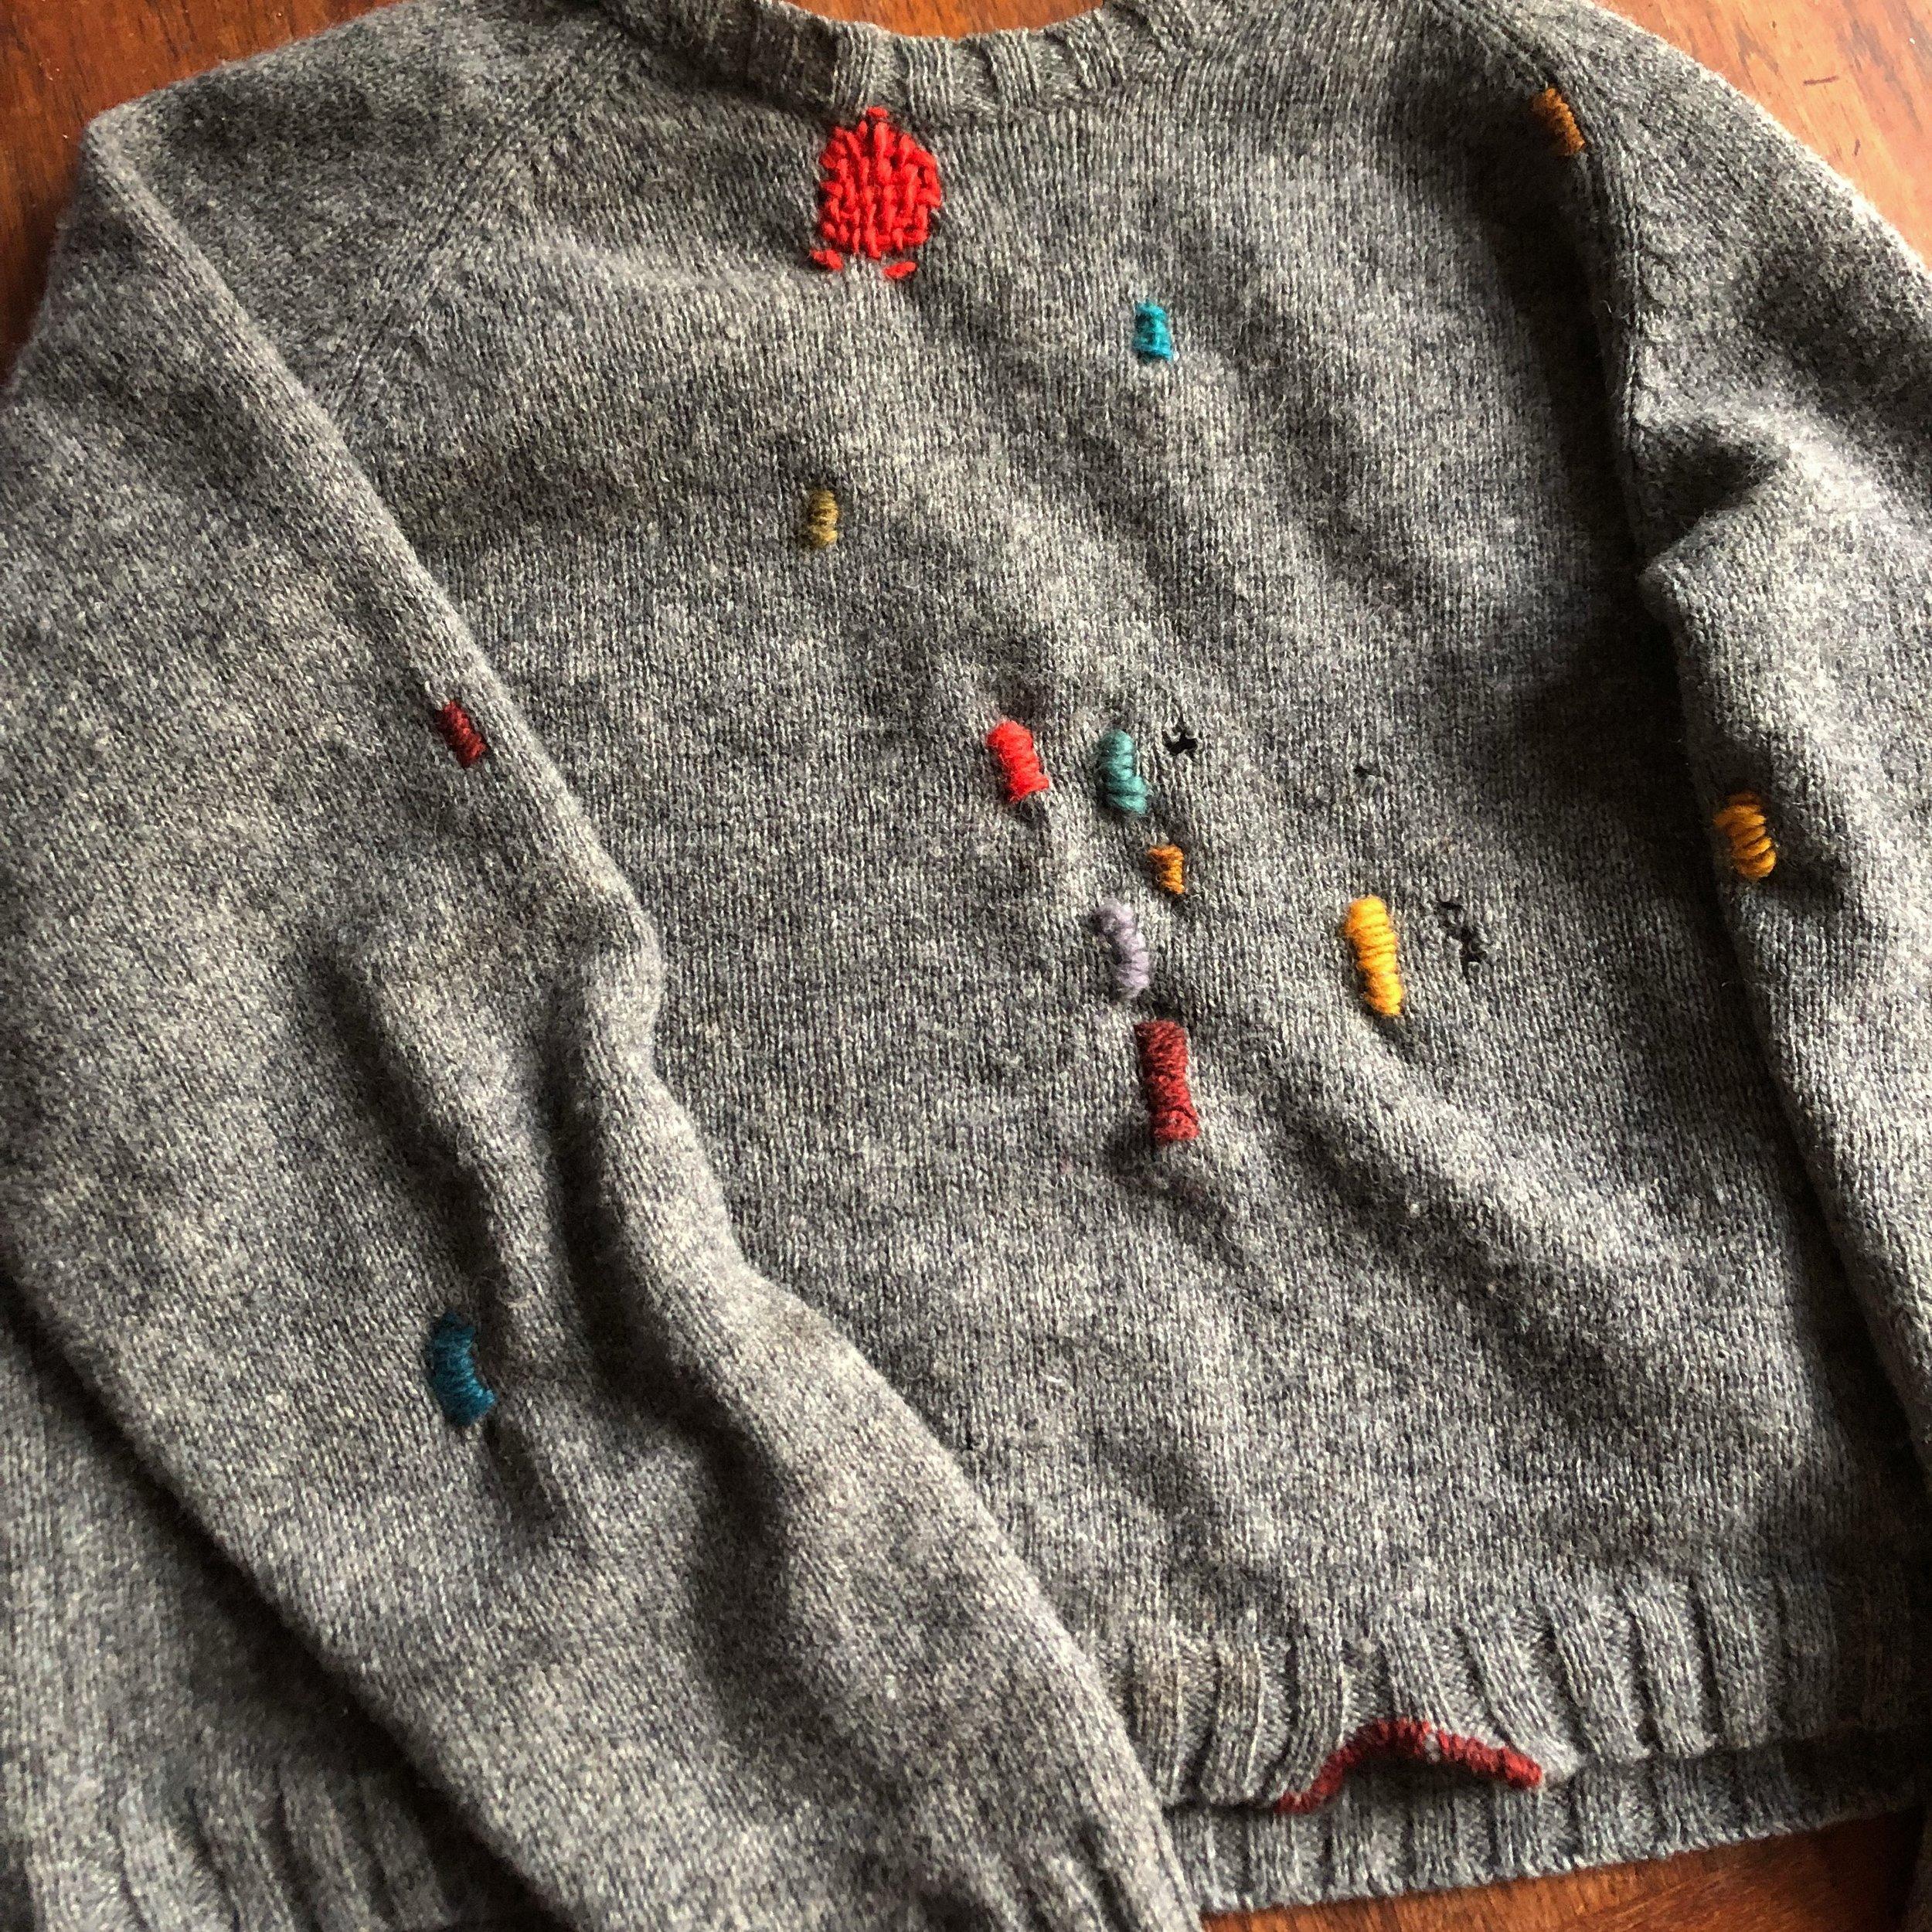 A colorful, fun darned sweater.